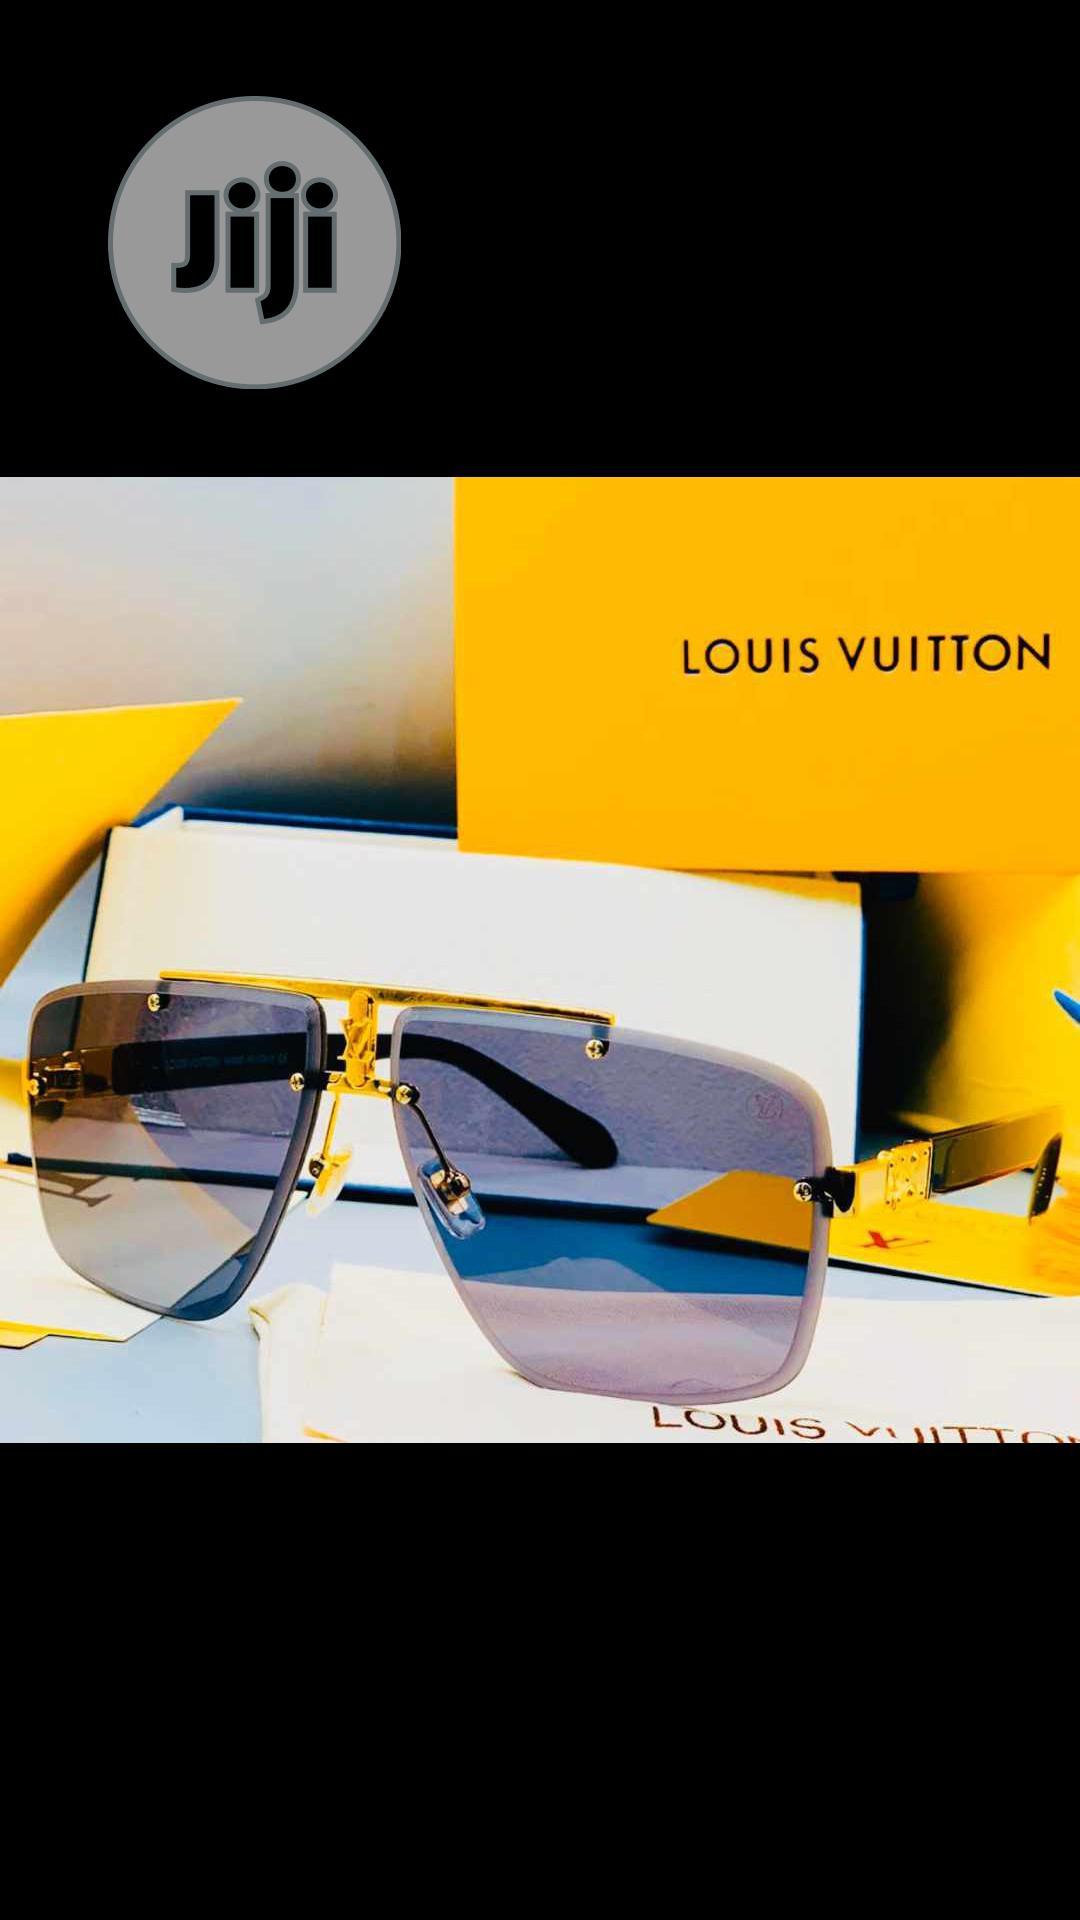 Louis Vuitton Sunglasses | Clothing Accessories for sale in Lagos Island, Lagos State, Nigeria